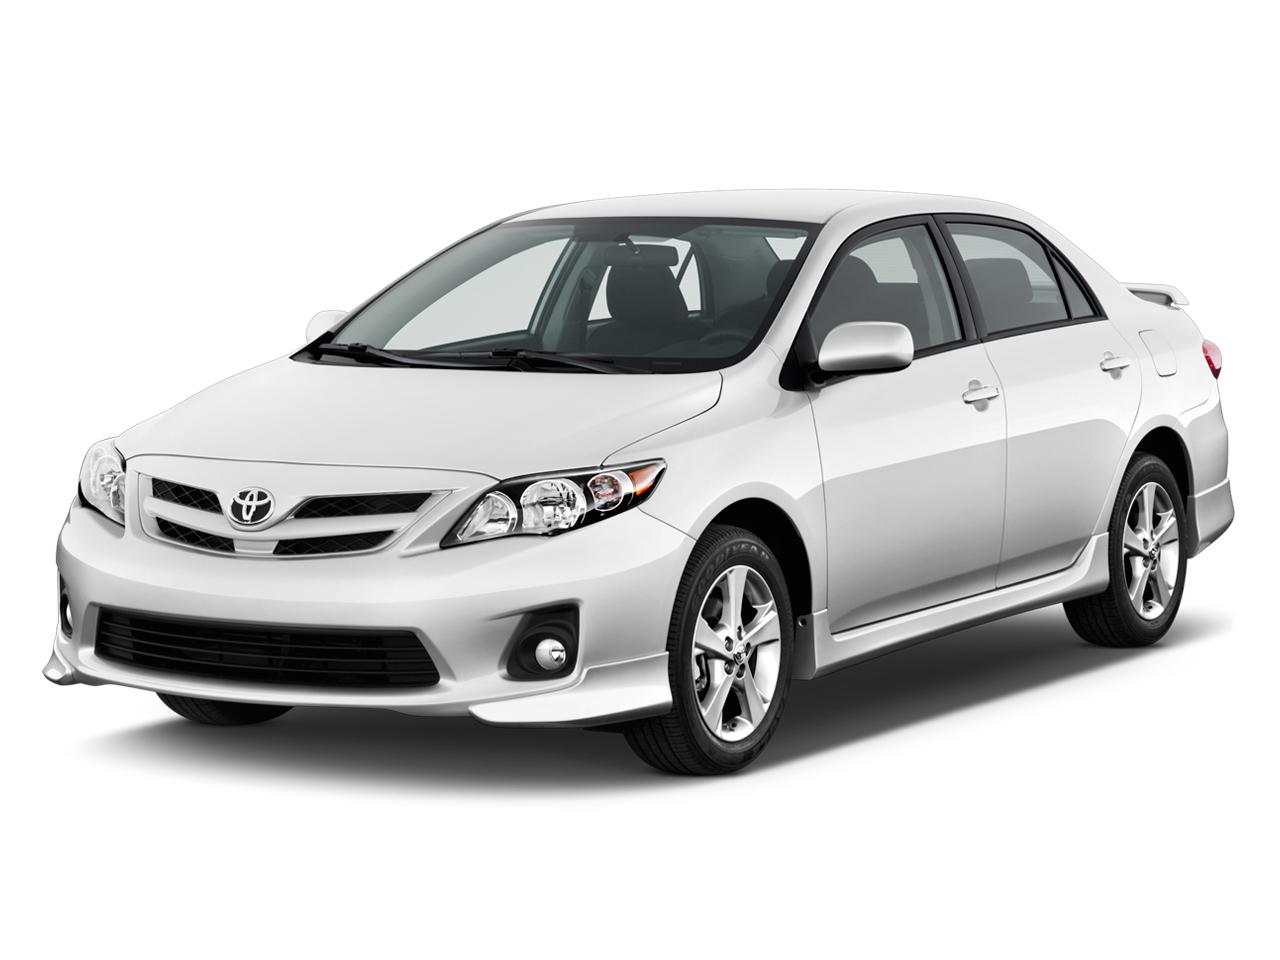 2011-toyota-corolla-4-door-sedan-auto-s-natl-angular-front-exterior-view_100345830_h.jpg